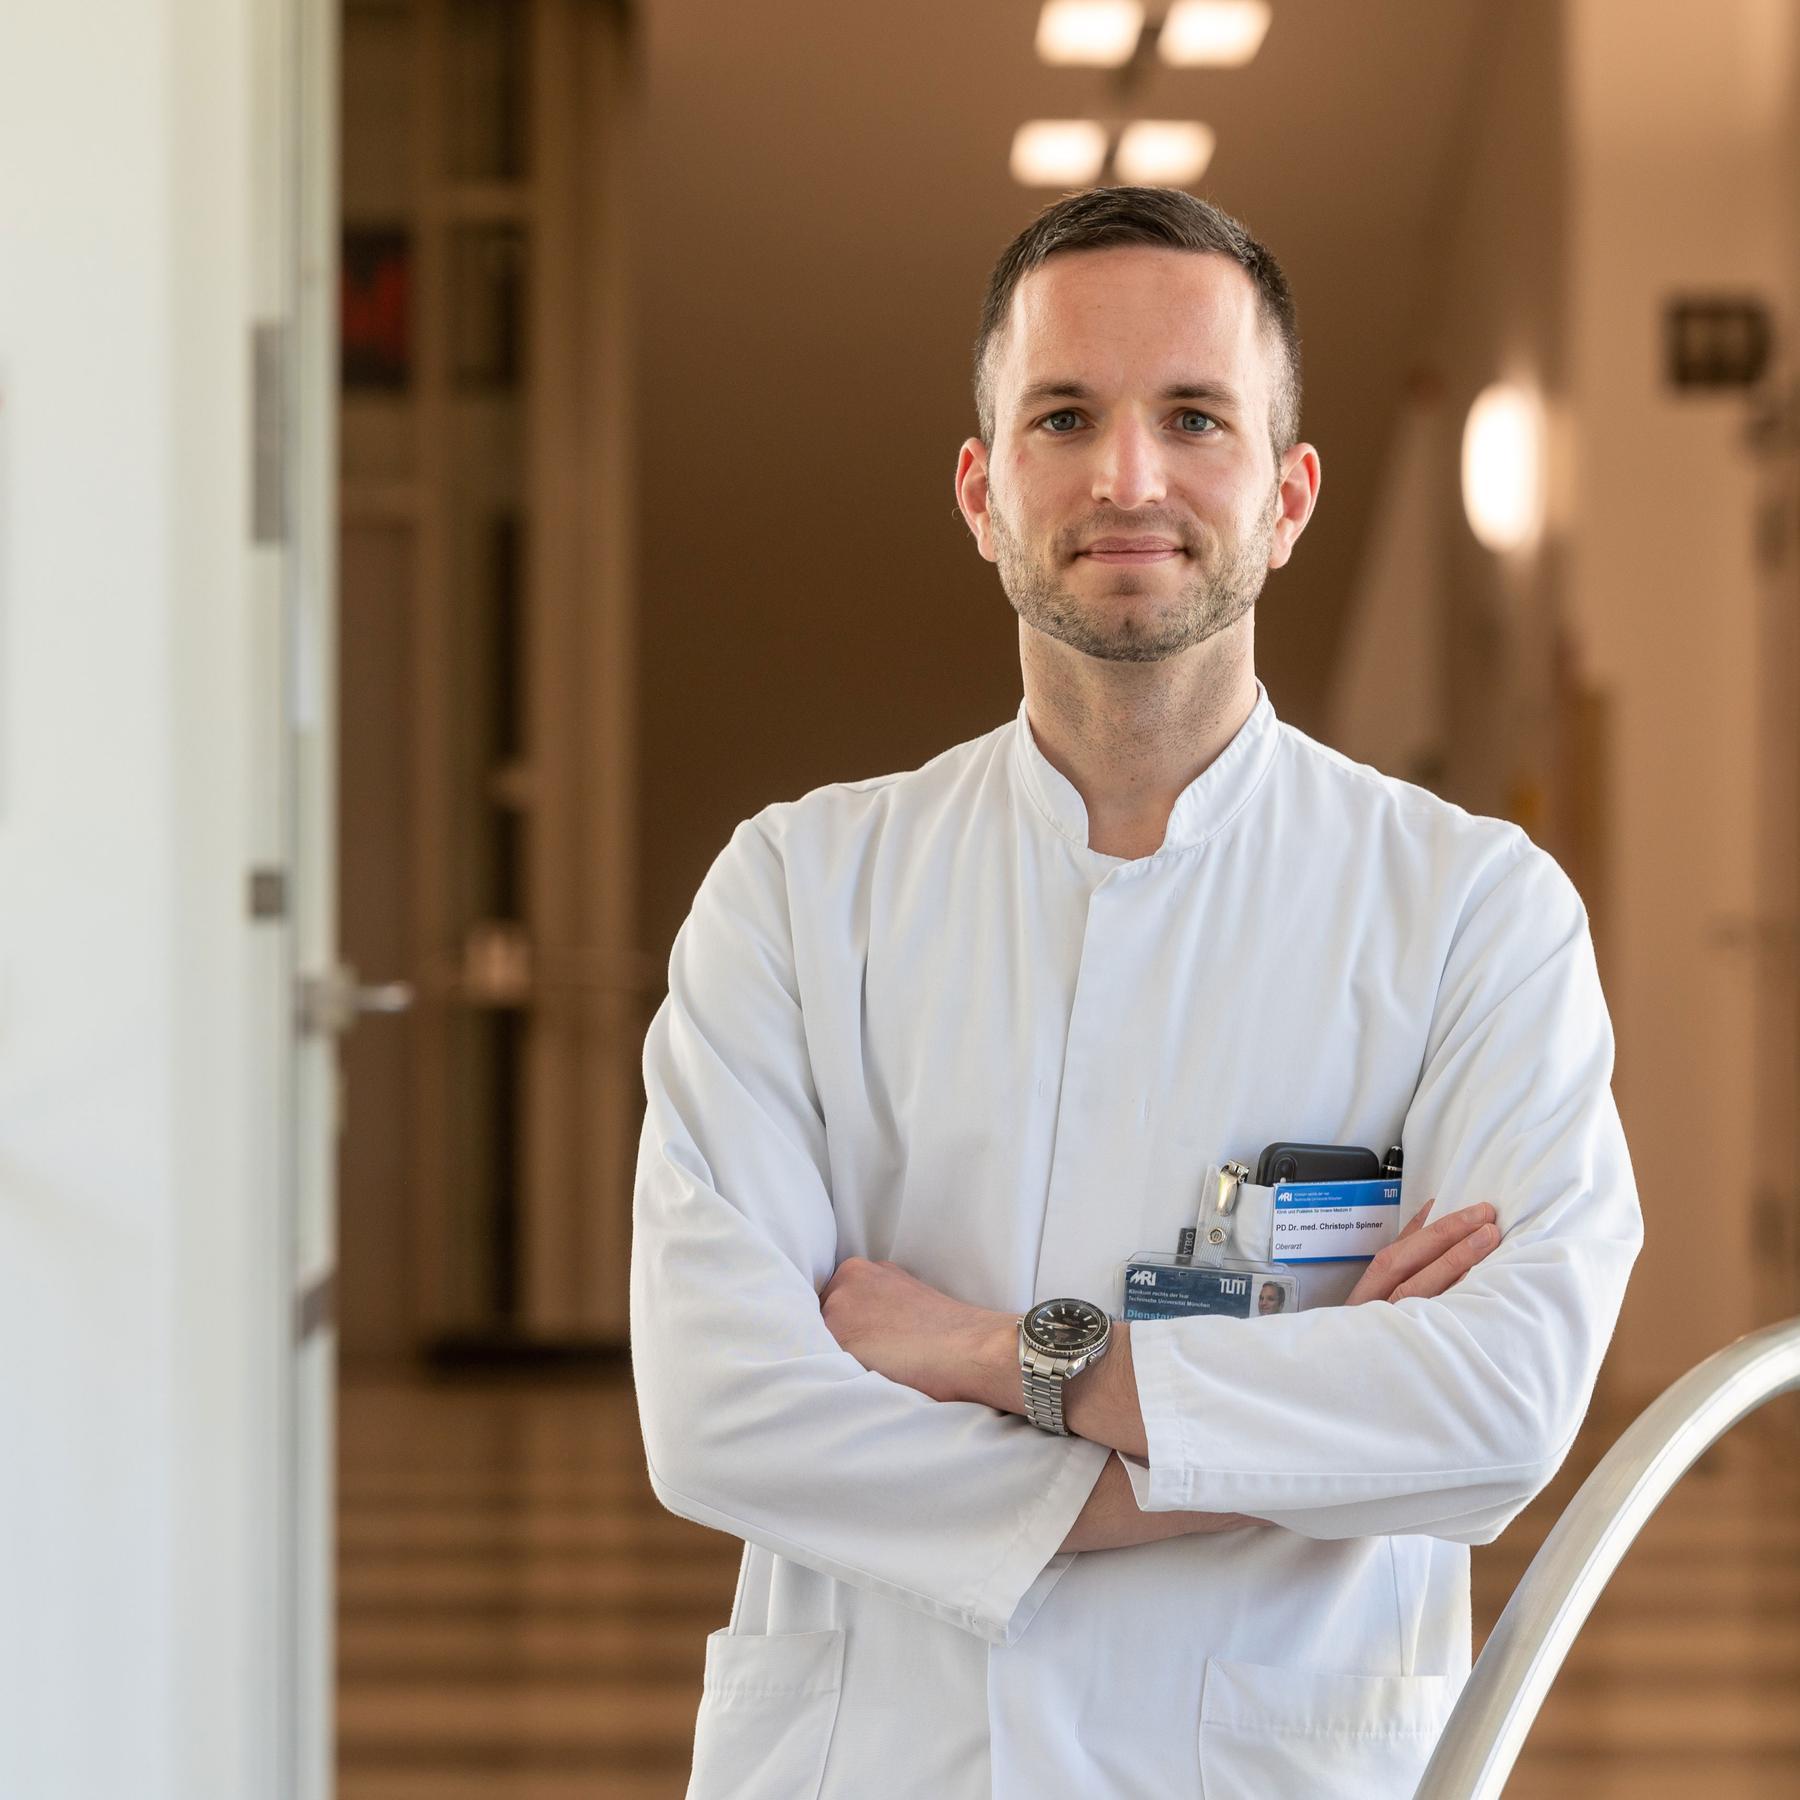 Corona-News mit Dr. Christoph Spinner (27.07.2021)